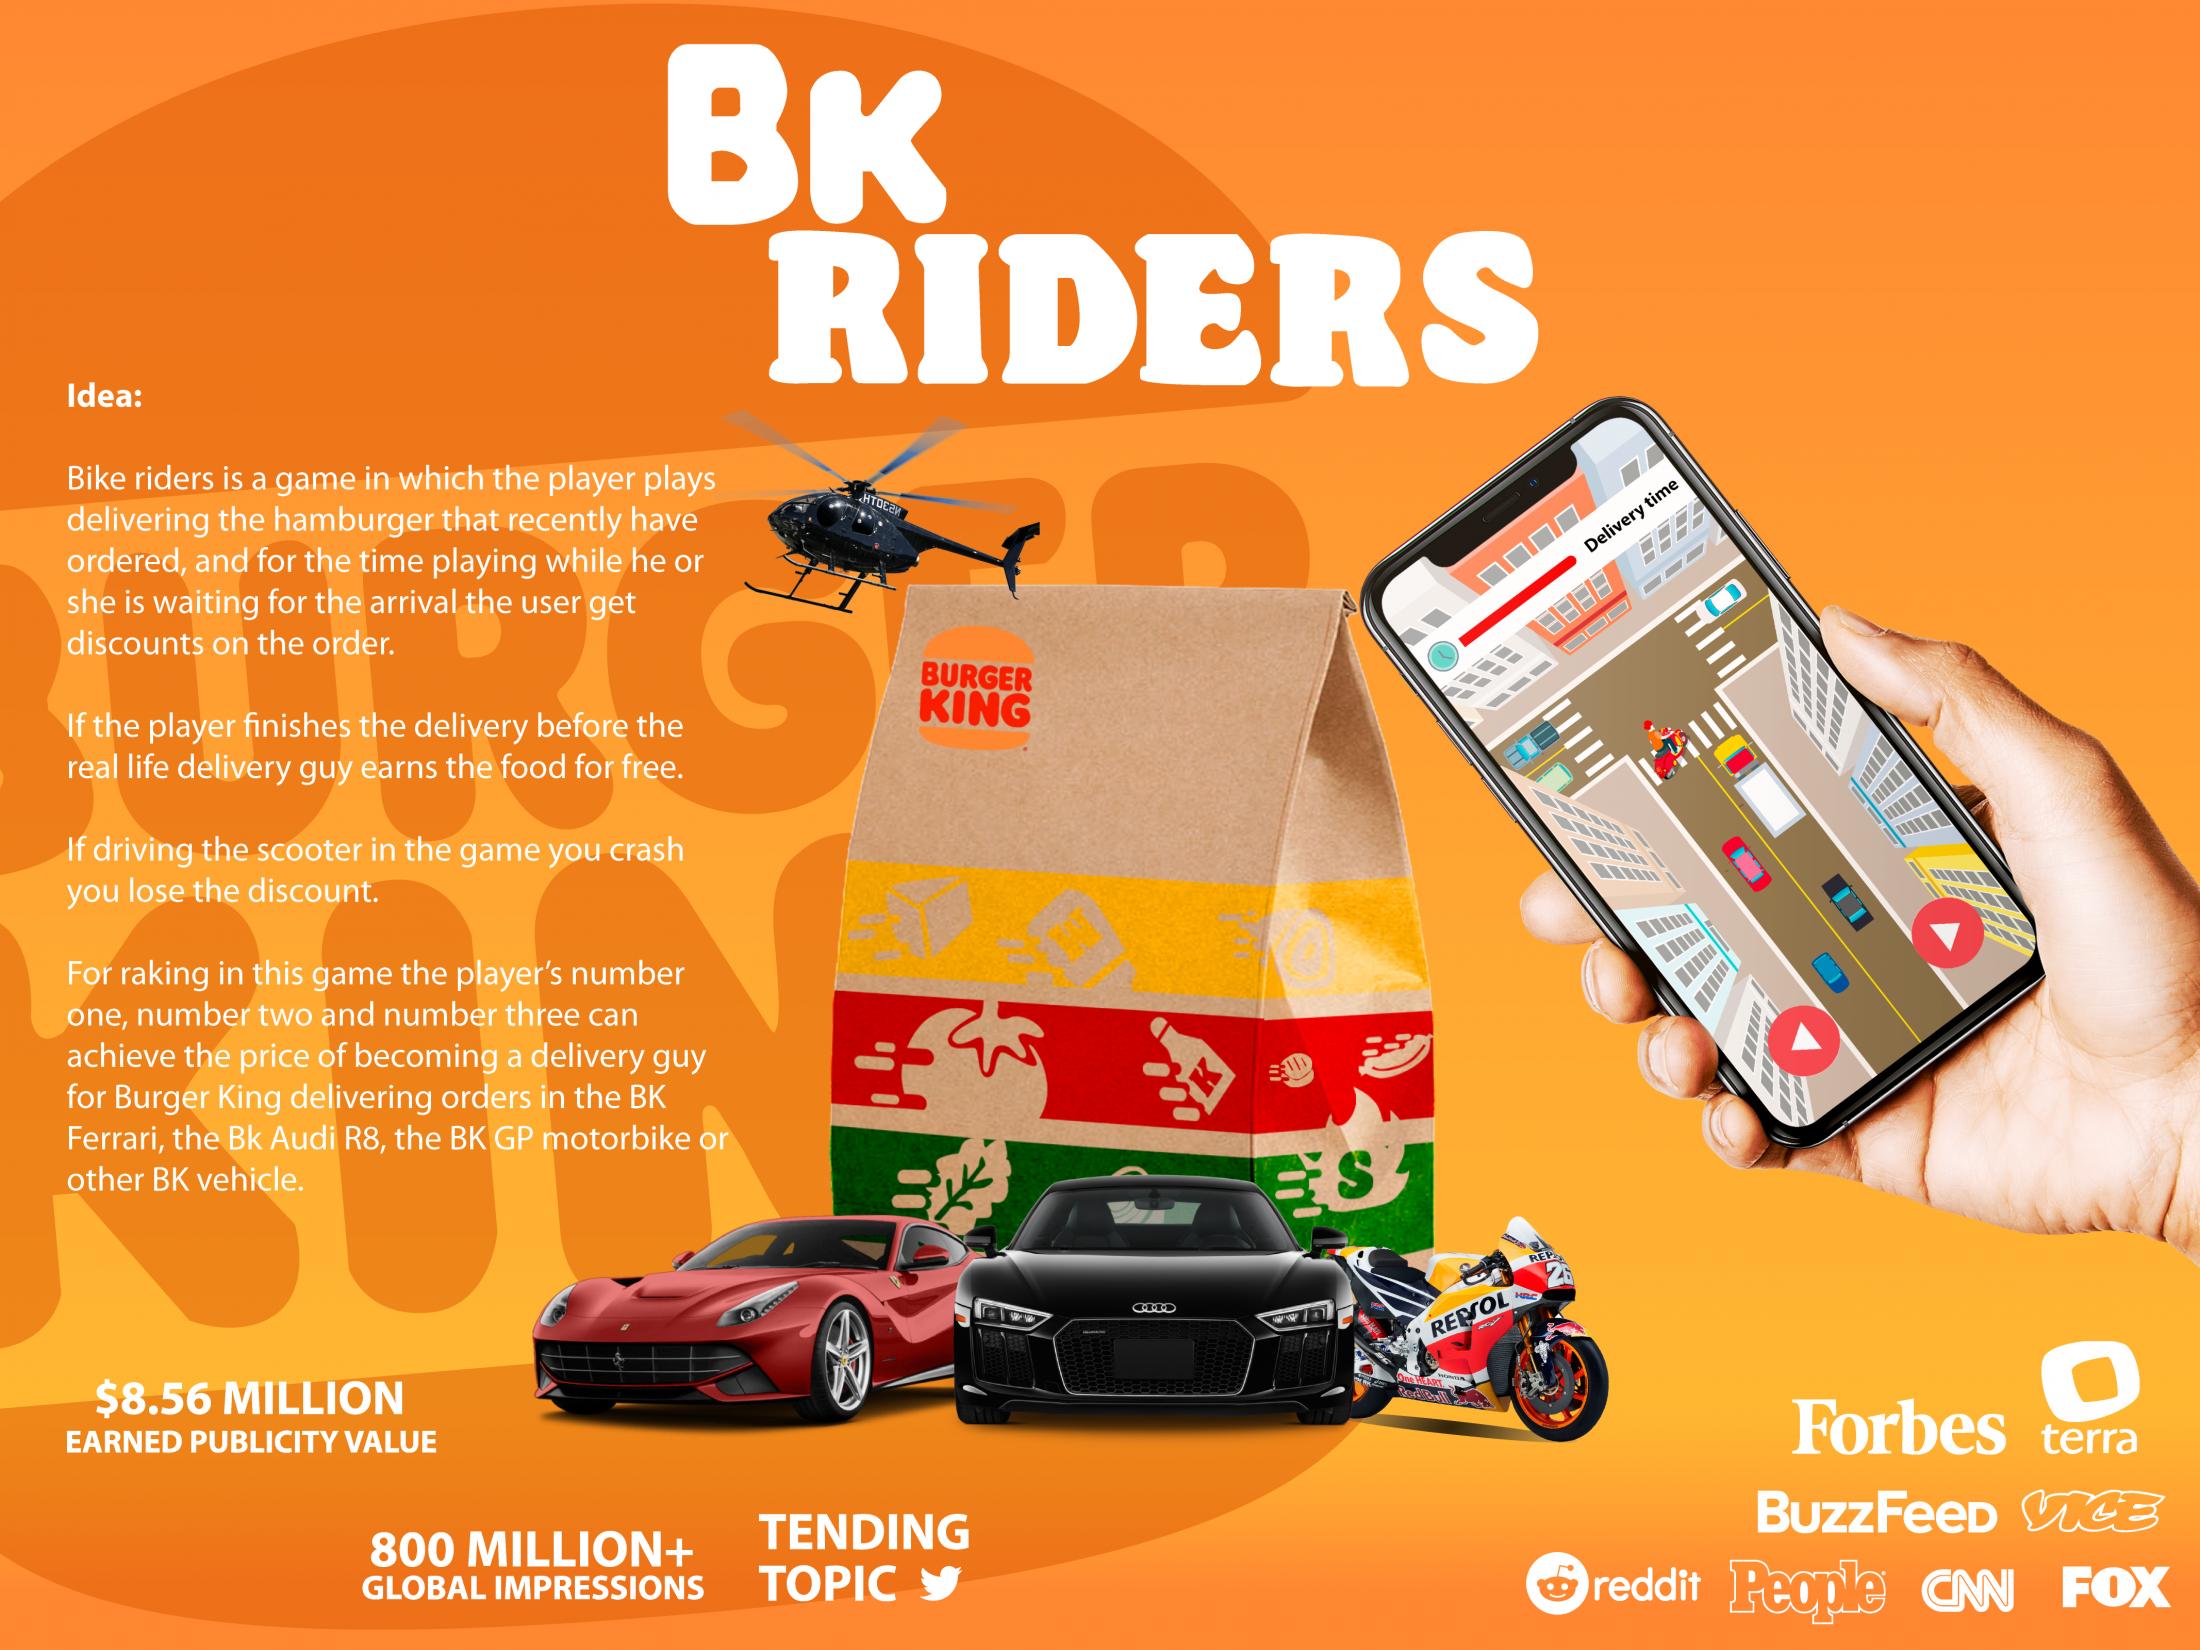 Thumbnail for BK RIDERS